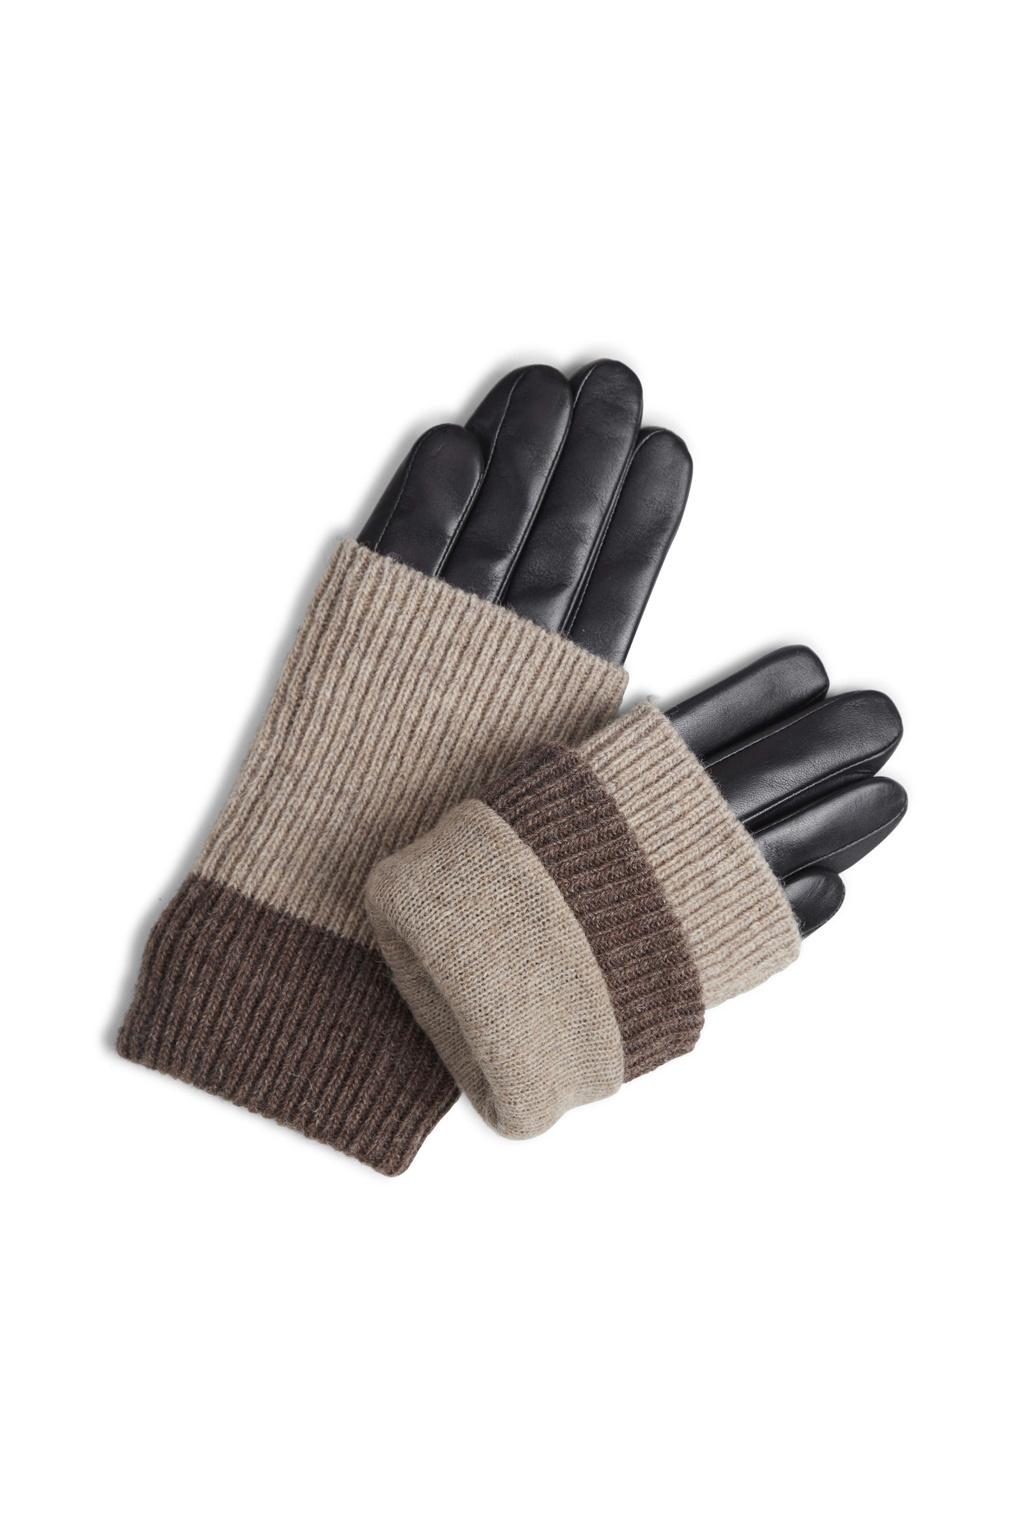 Helly Glove - Black w/ Creme + Hazel-3